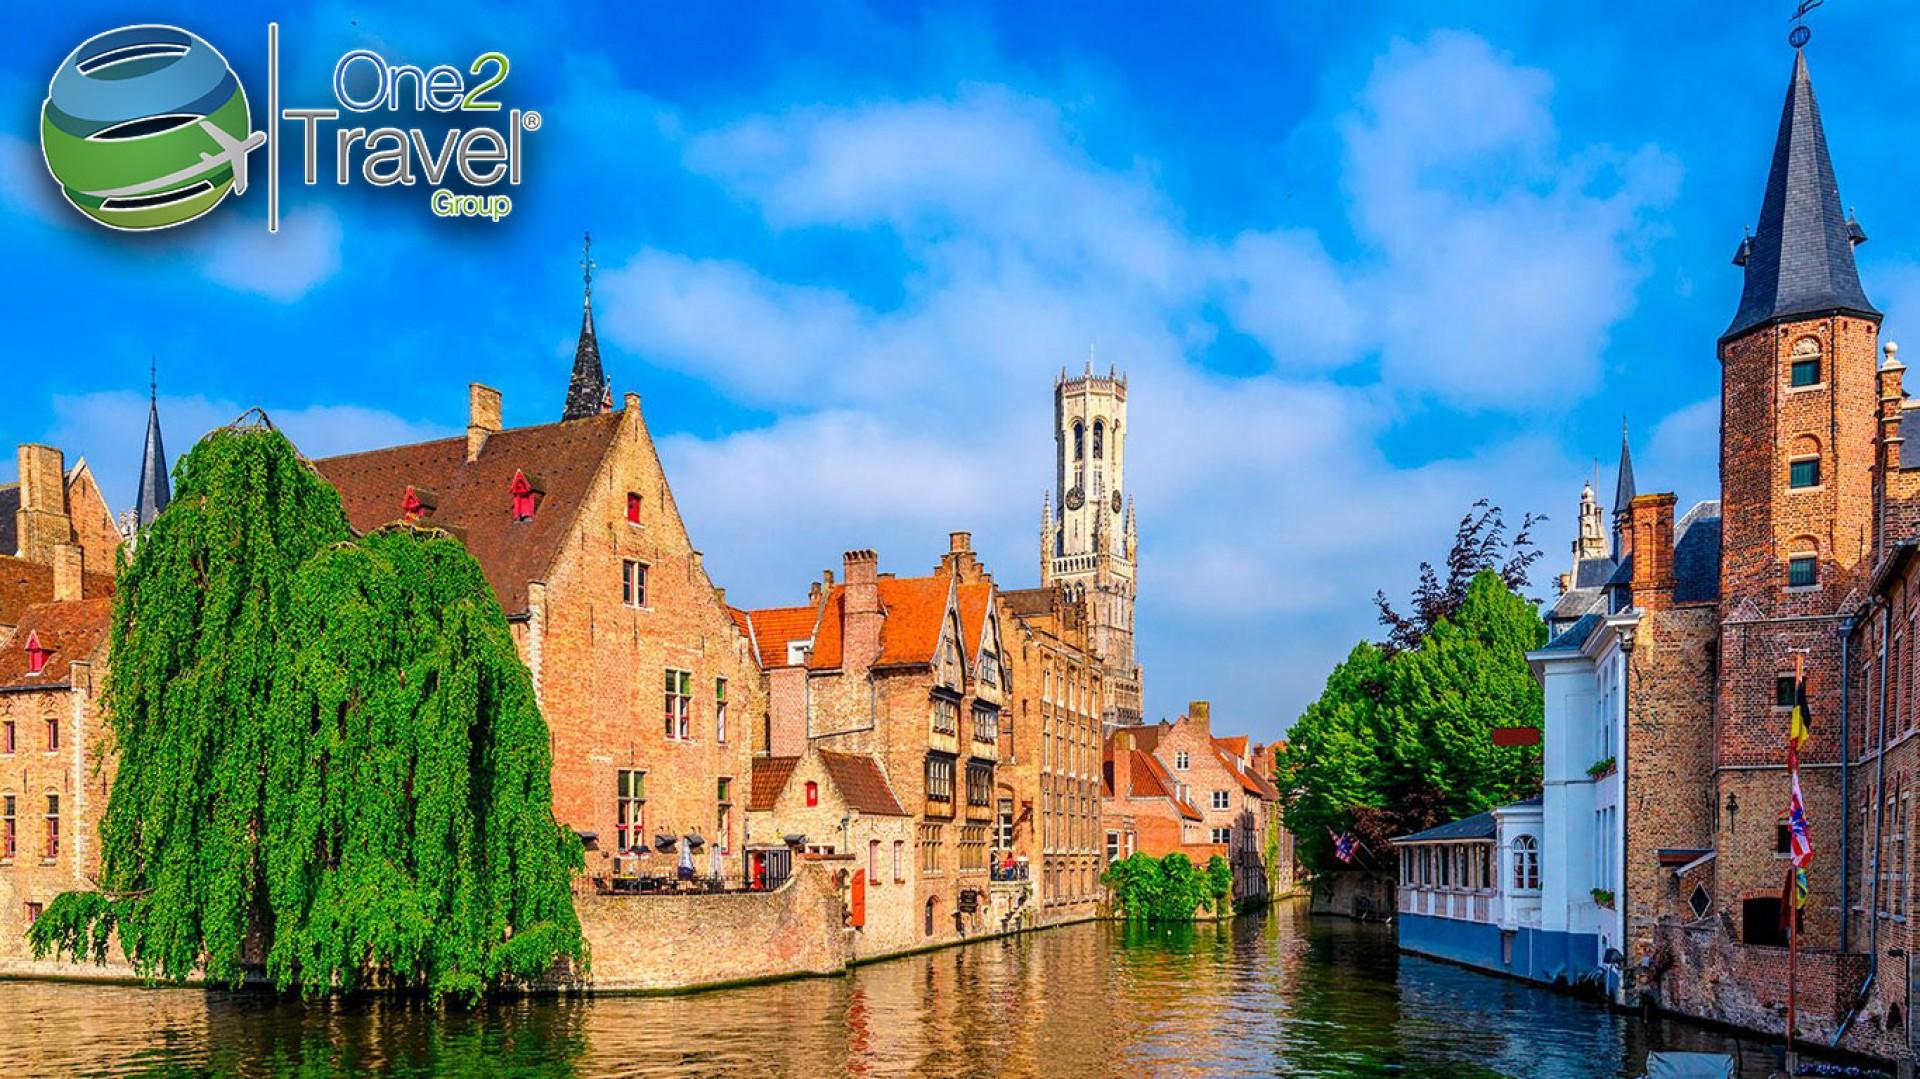 Seminario Web | One2Travel | Bélgica & Países Bajos (2ª parte)